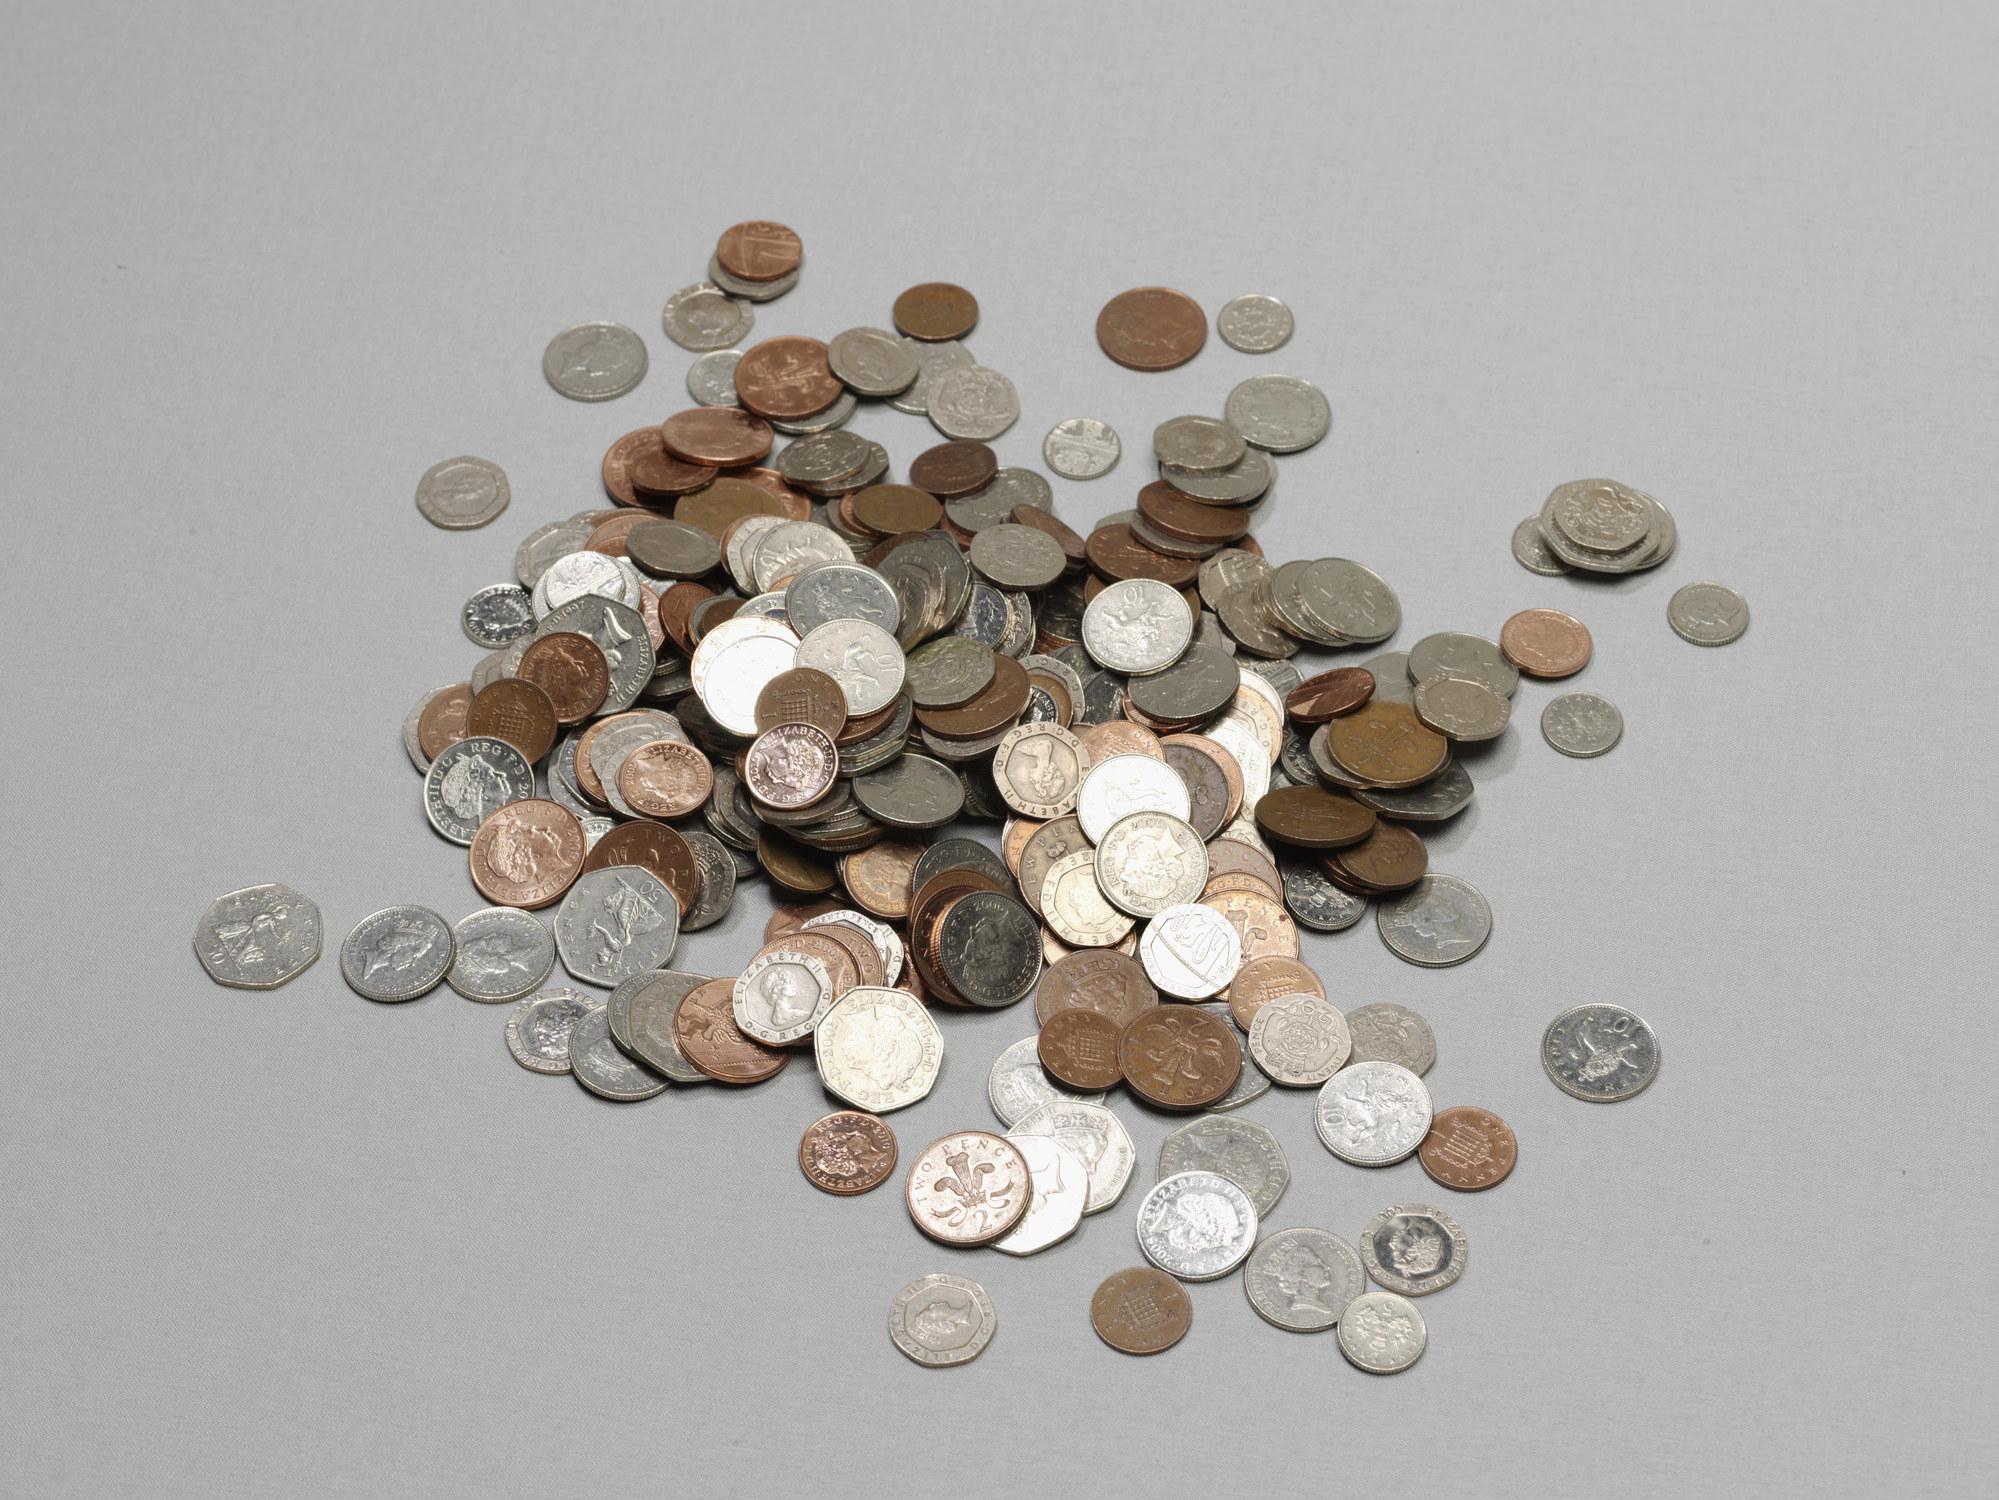 Pile of loose change